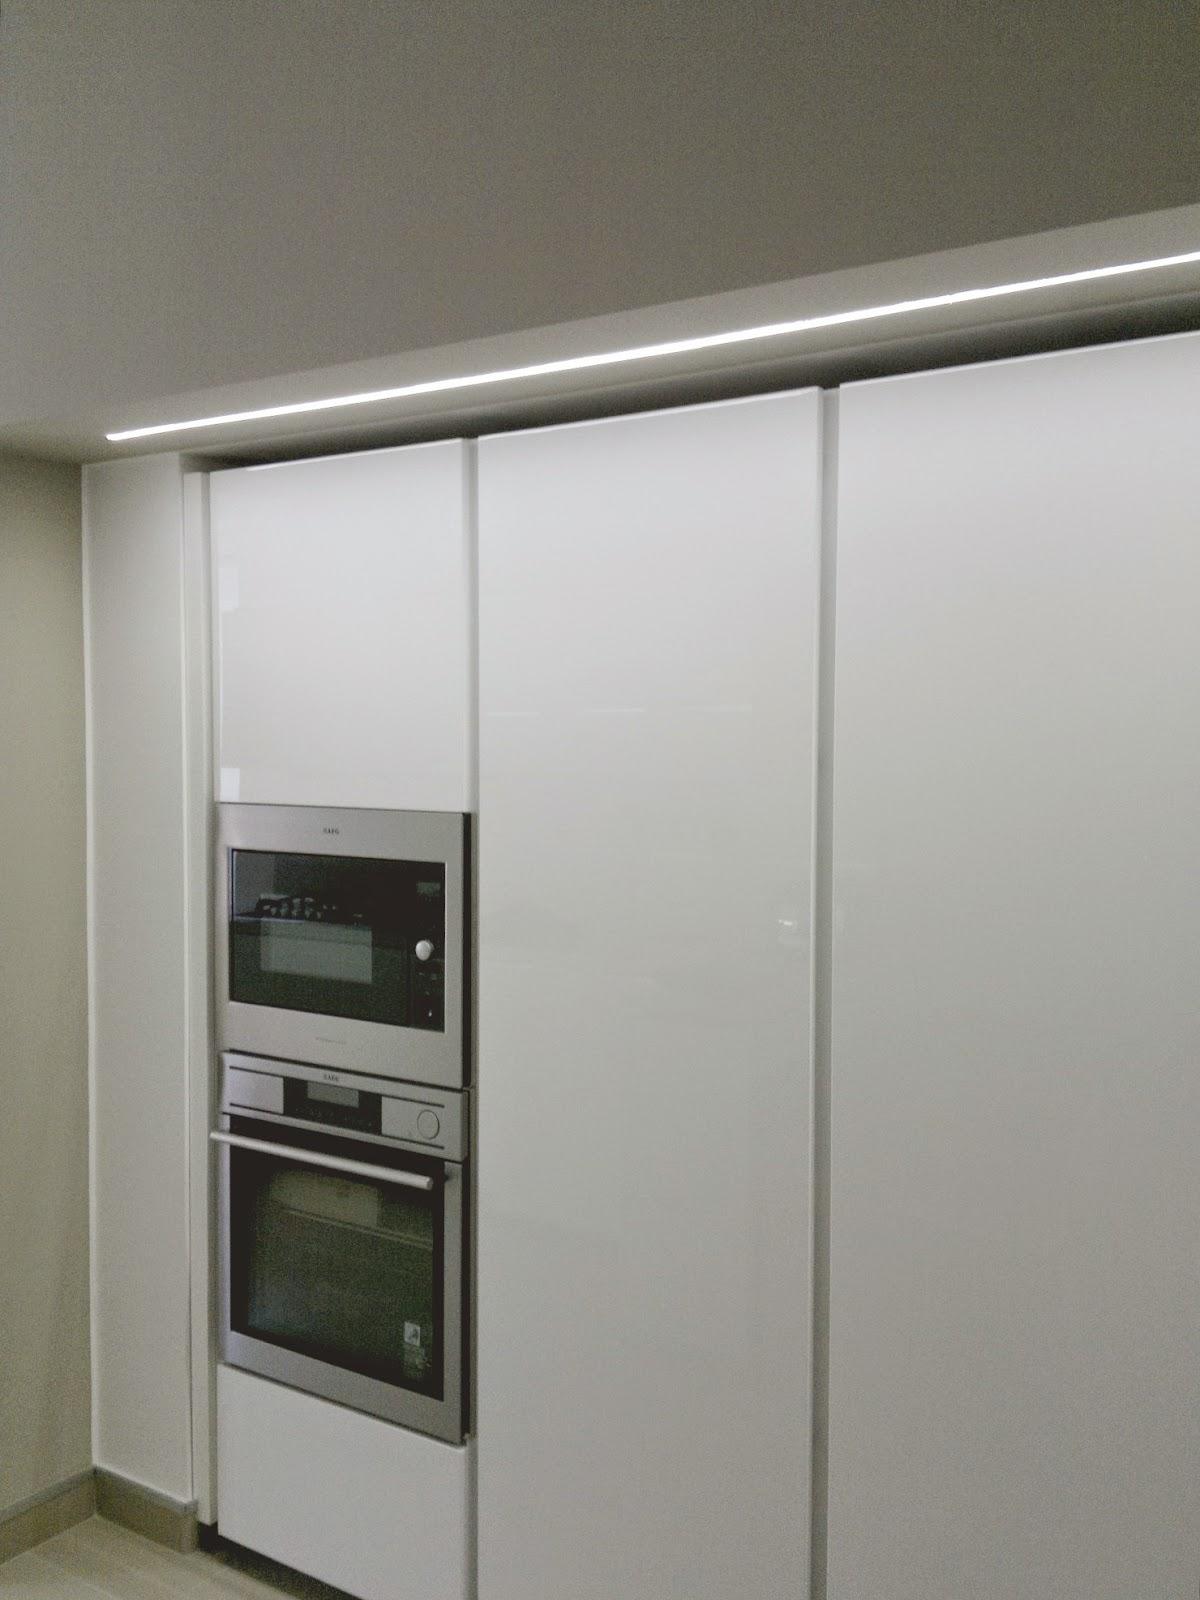 Emejing Luci Led Per Cucina Contemporary - House Interior ...